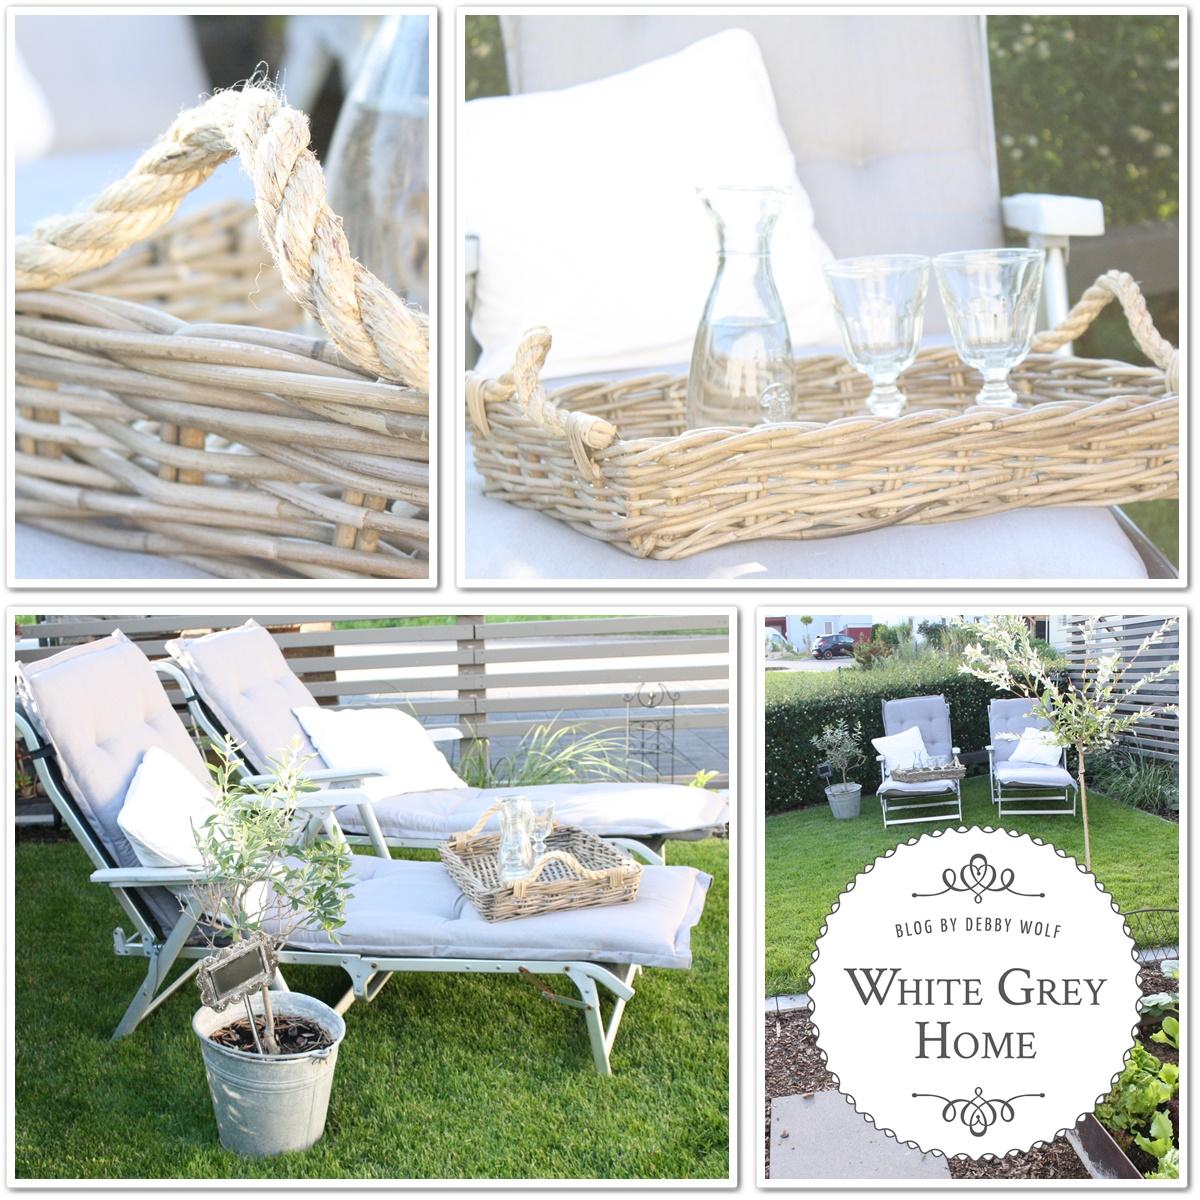 white grey home urlaub zu hause. Black Bedroom Furniture Sets. Home Design Ideas